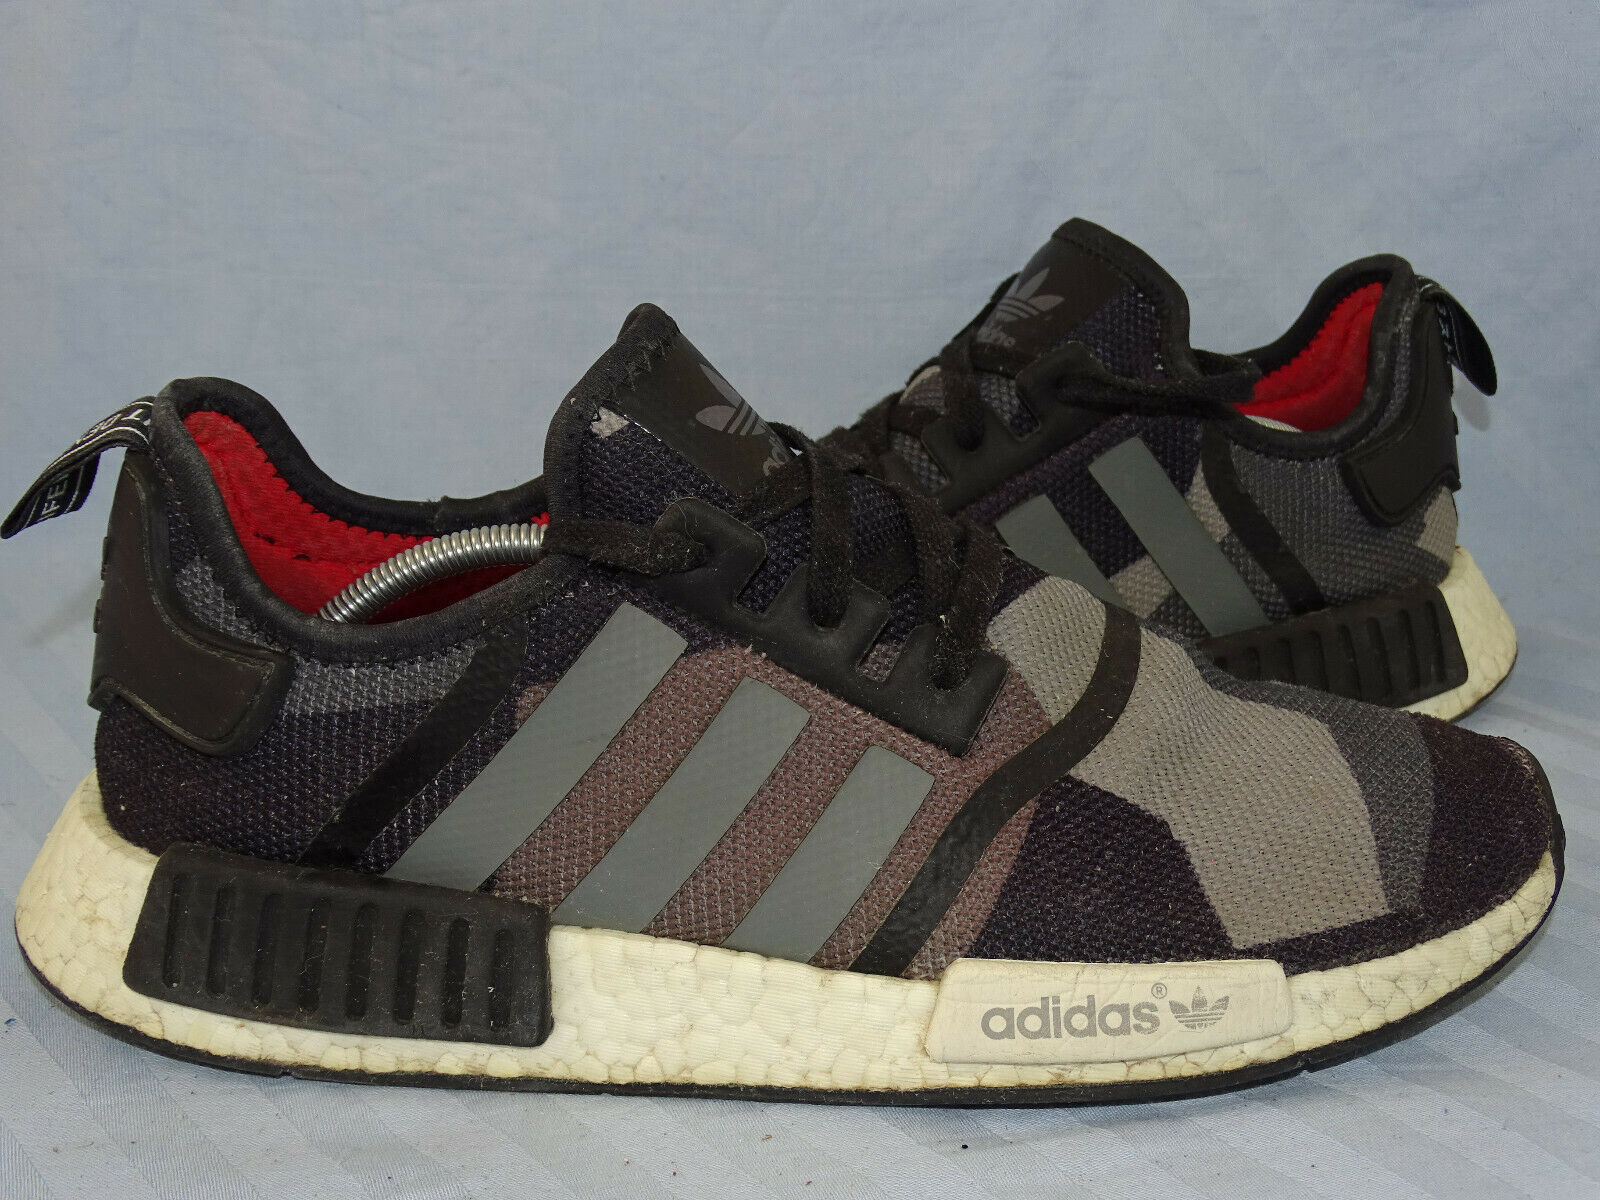 Adidas NMD r1 Boost CAMO noir marron gris rareHommest paniers Turtle T 46 Limited